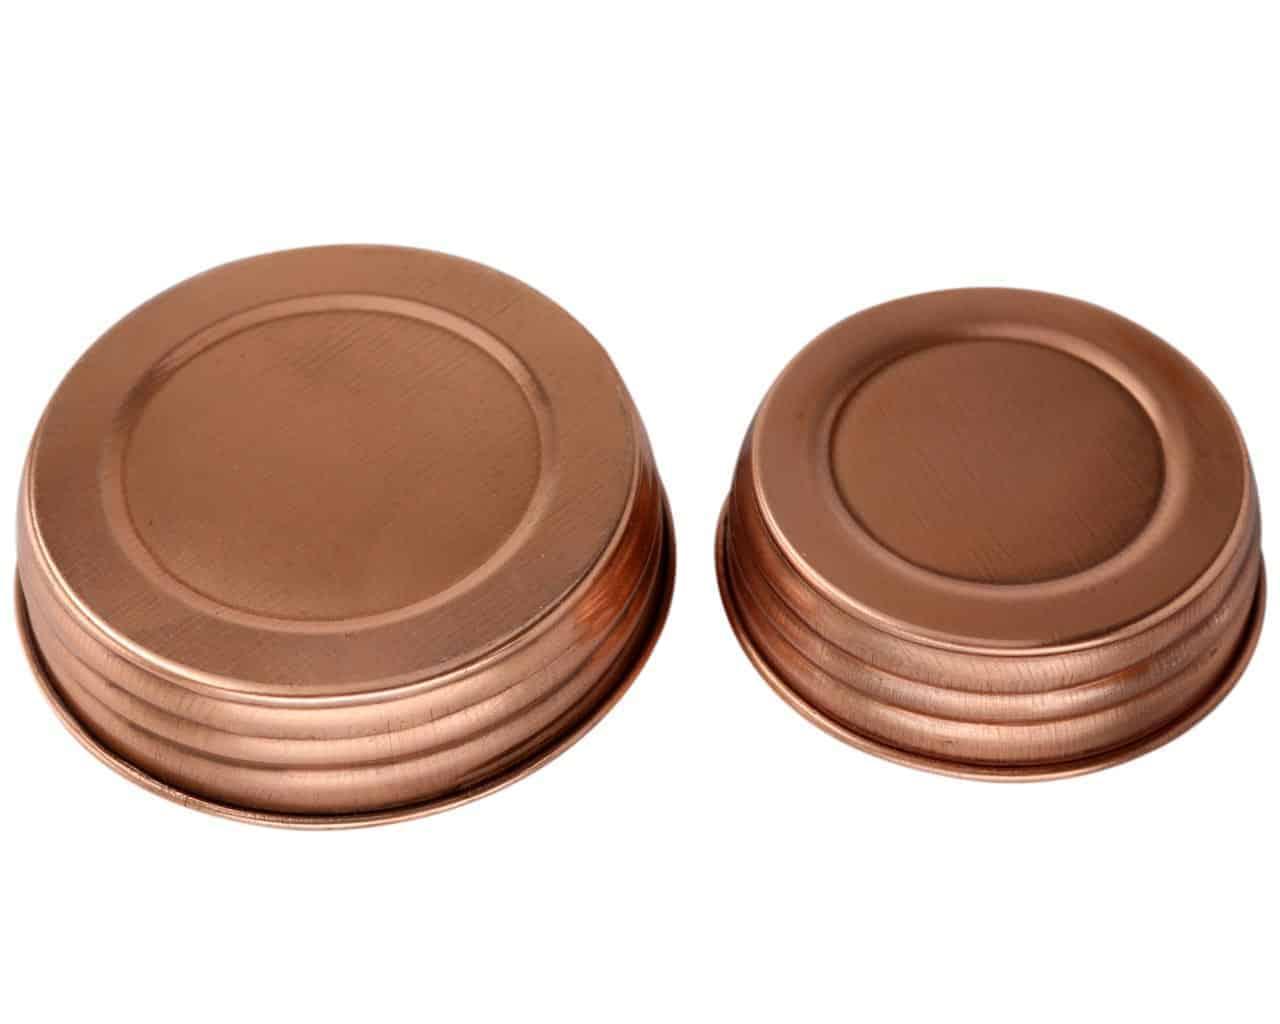 Shiny Copper Decorative Mason Jar Lids 4 Pack